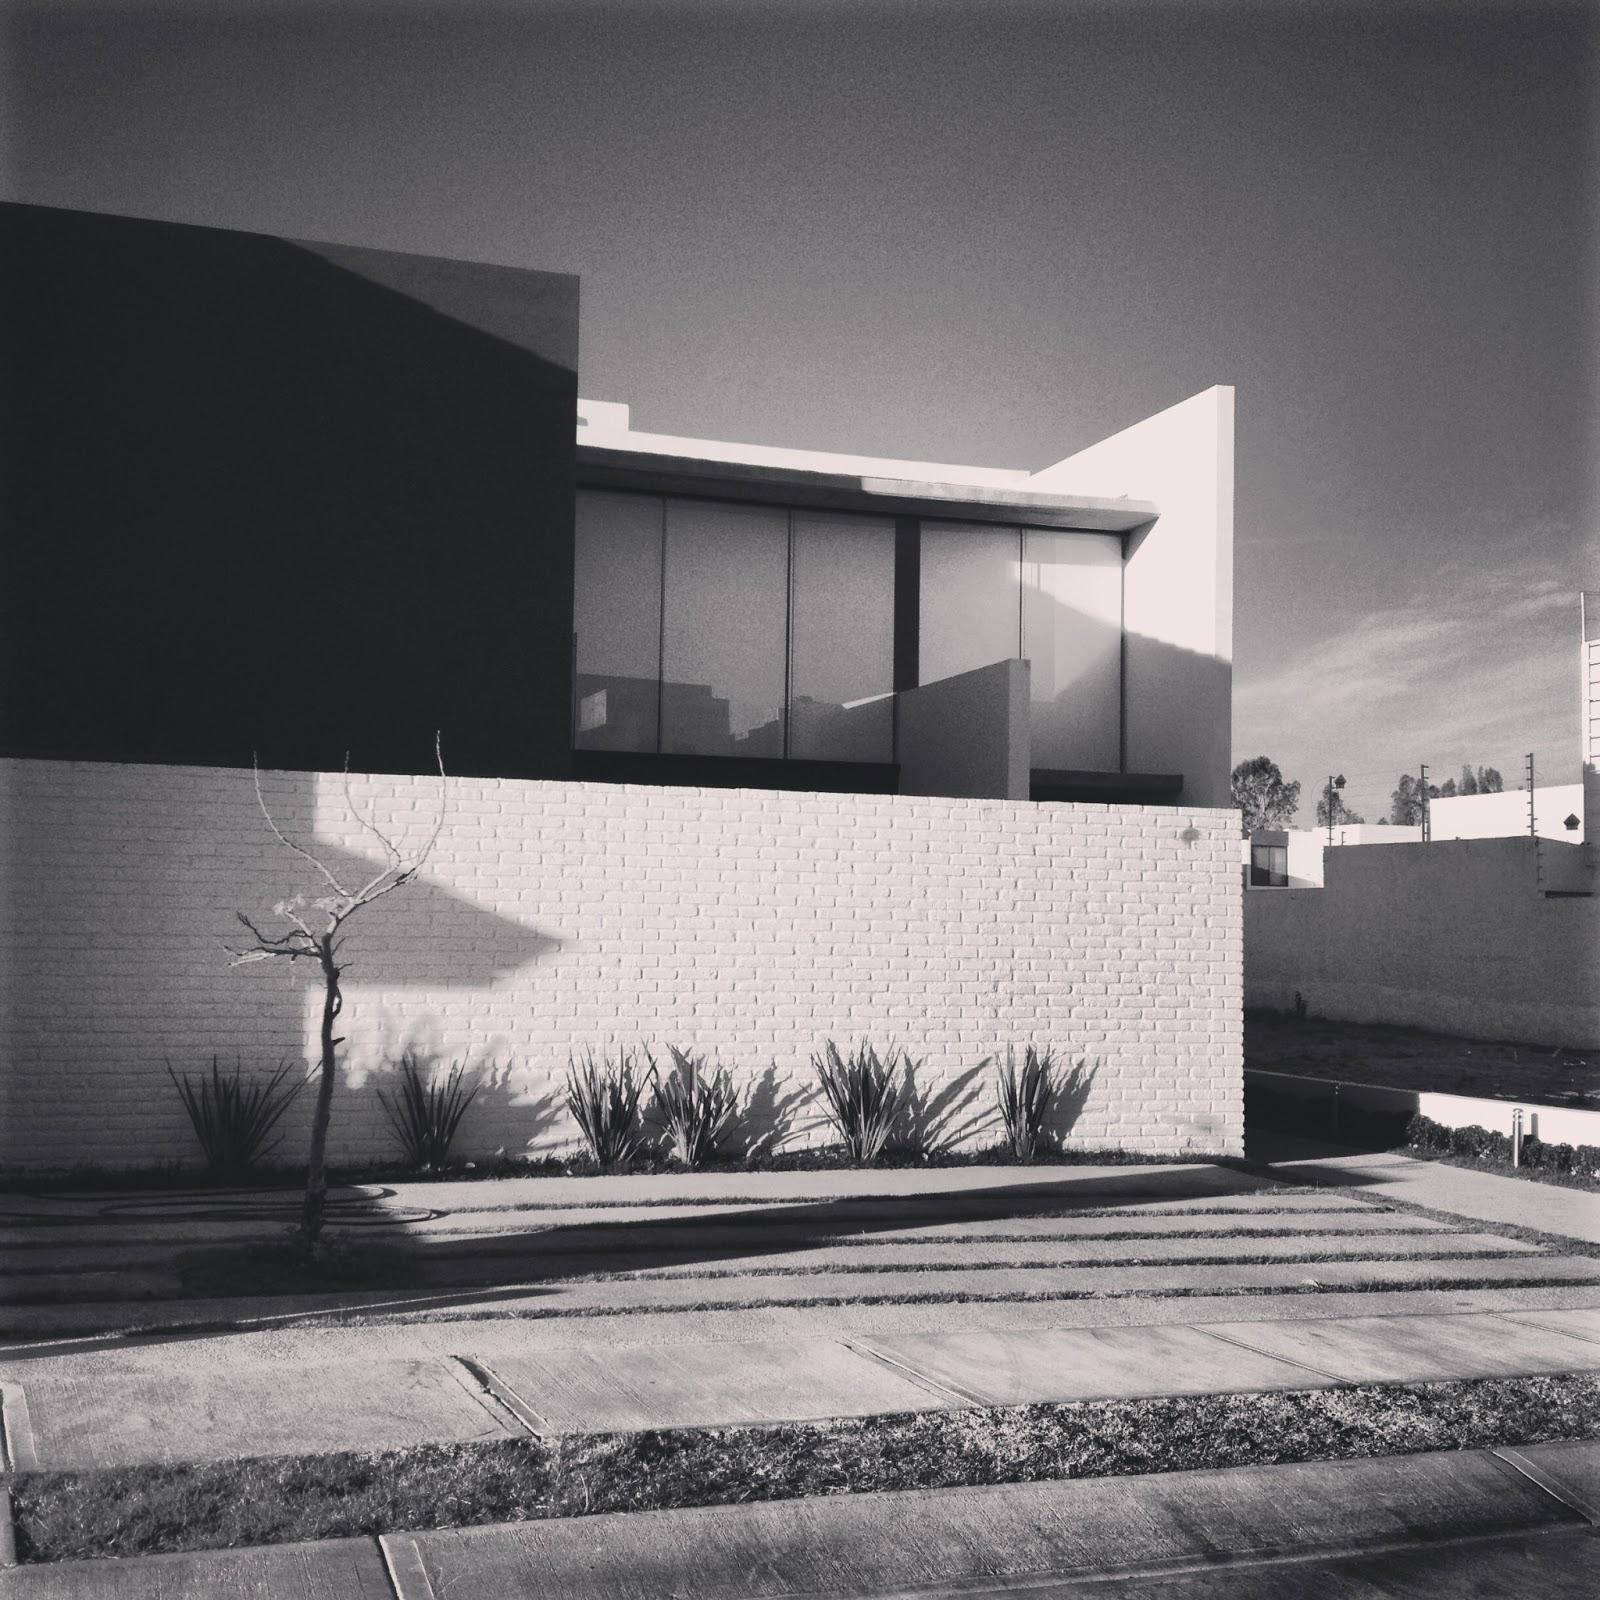 arquitectura mexicana